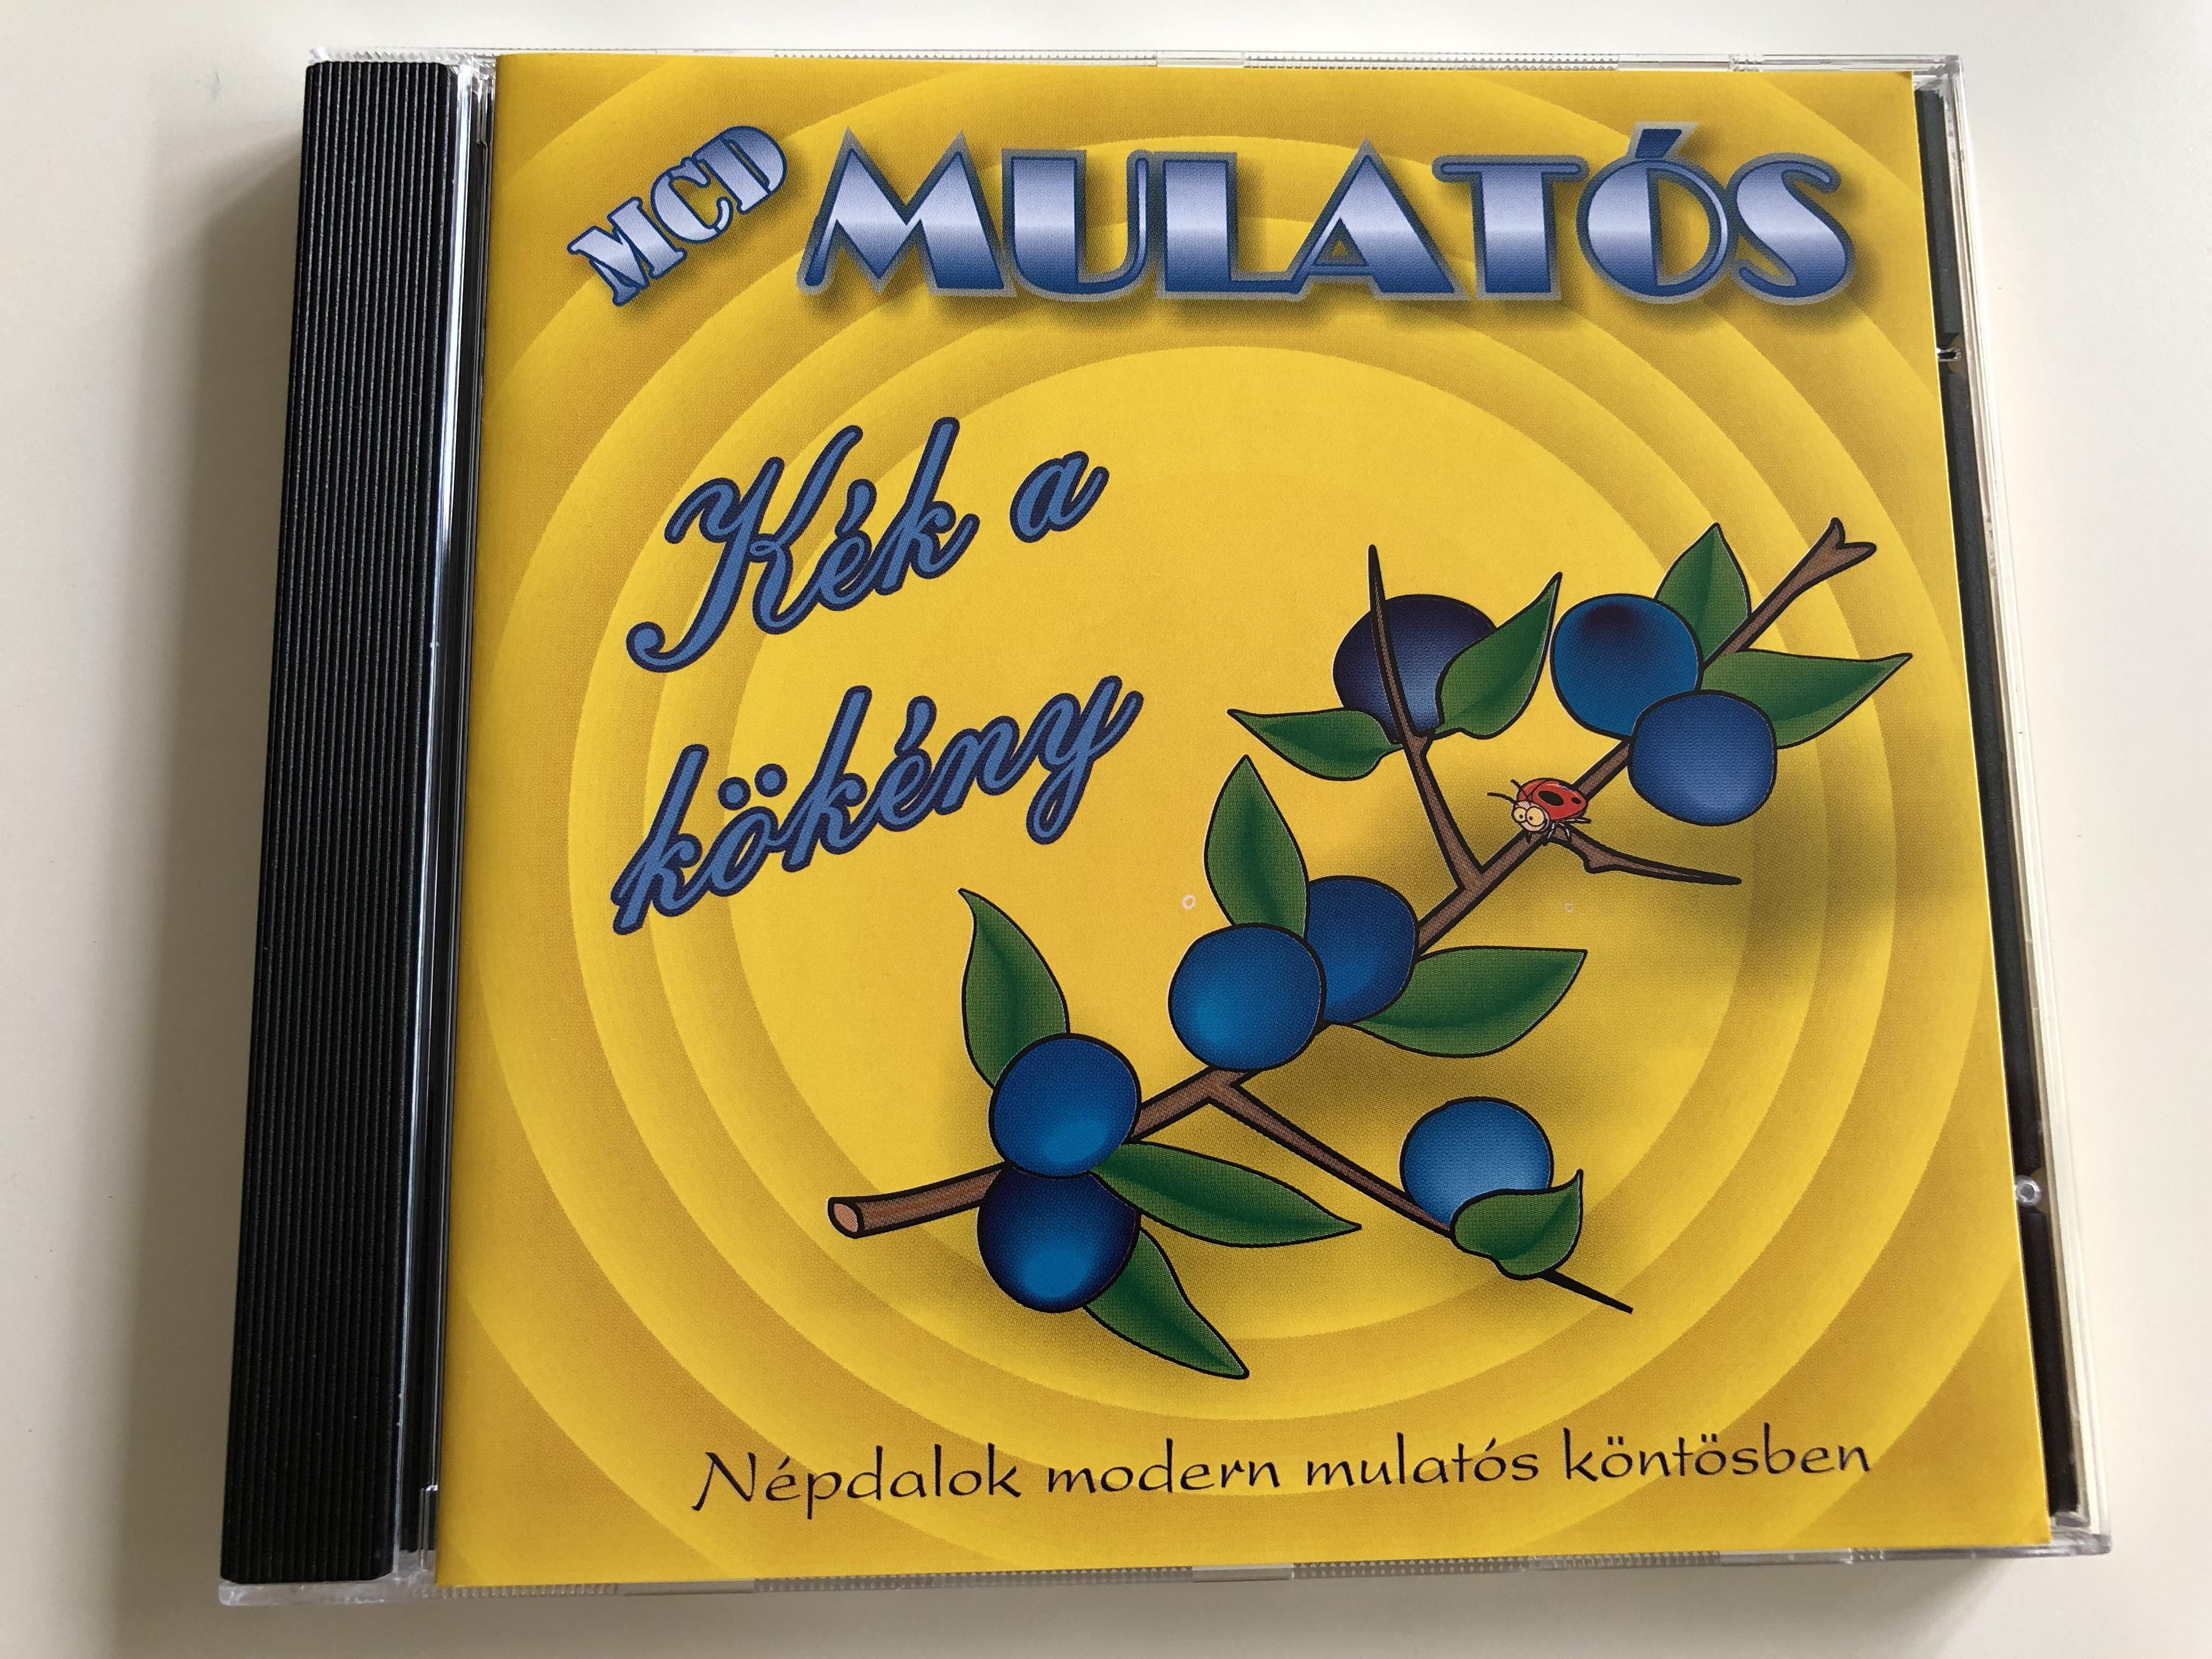 mulat-s-k-k-a-k-k-ny-n-pdalok-modern-mulat-s-k-nt-sben-z-ld-szalagos-kalapom-a-horgosi-cs-rda-a-faluban-nincs-t-bb-kisl-ny-audio-cd-2006-musicdome-0552mcd-1-.jpg